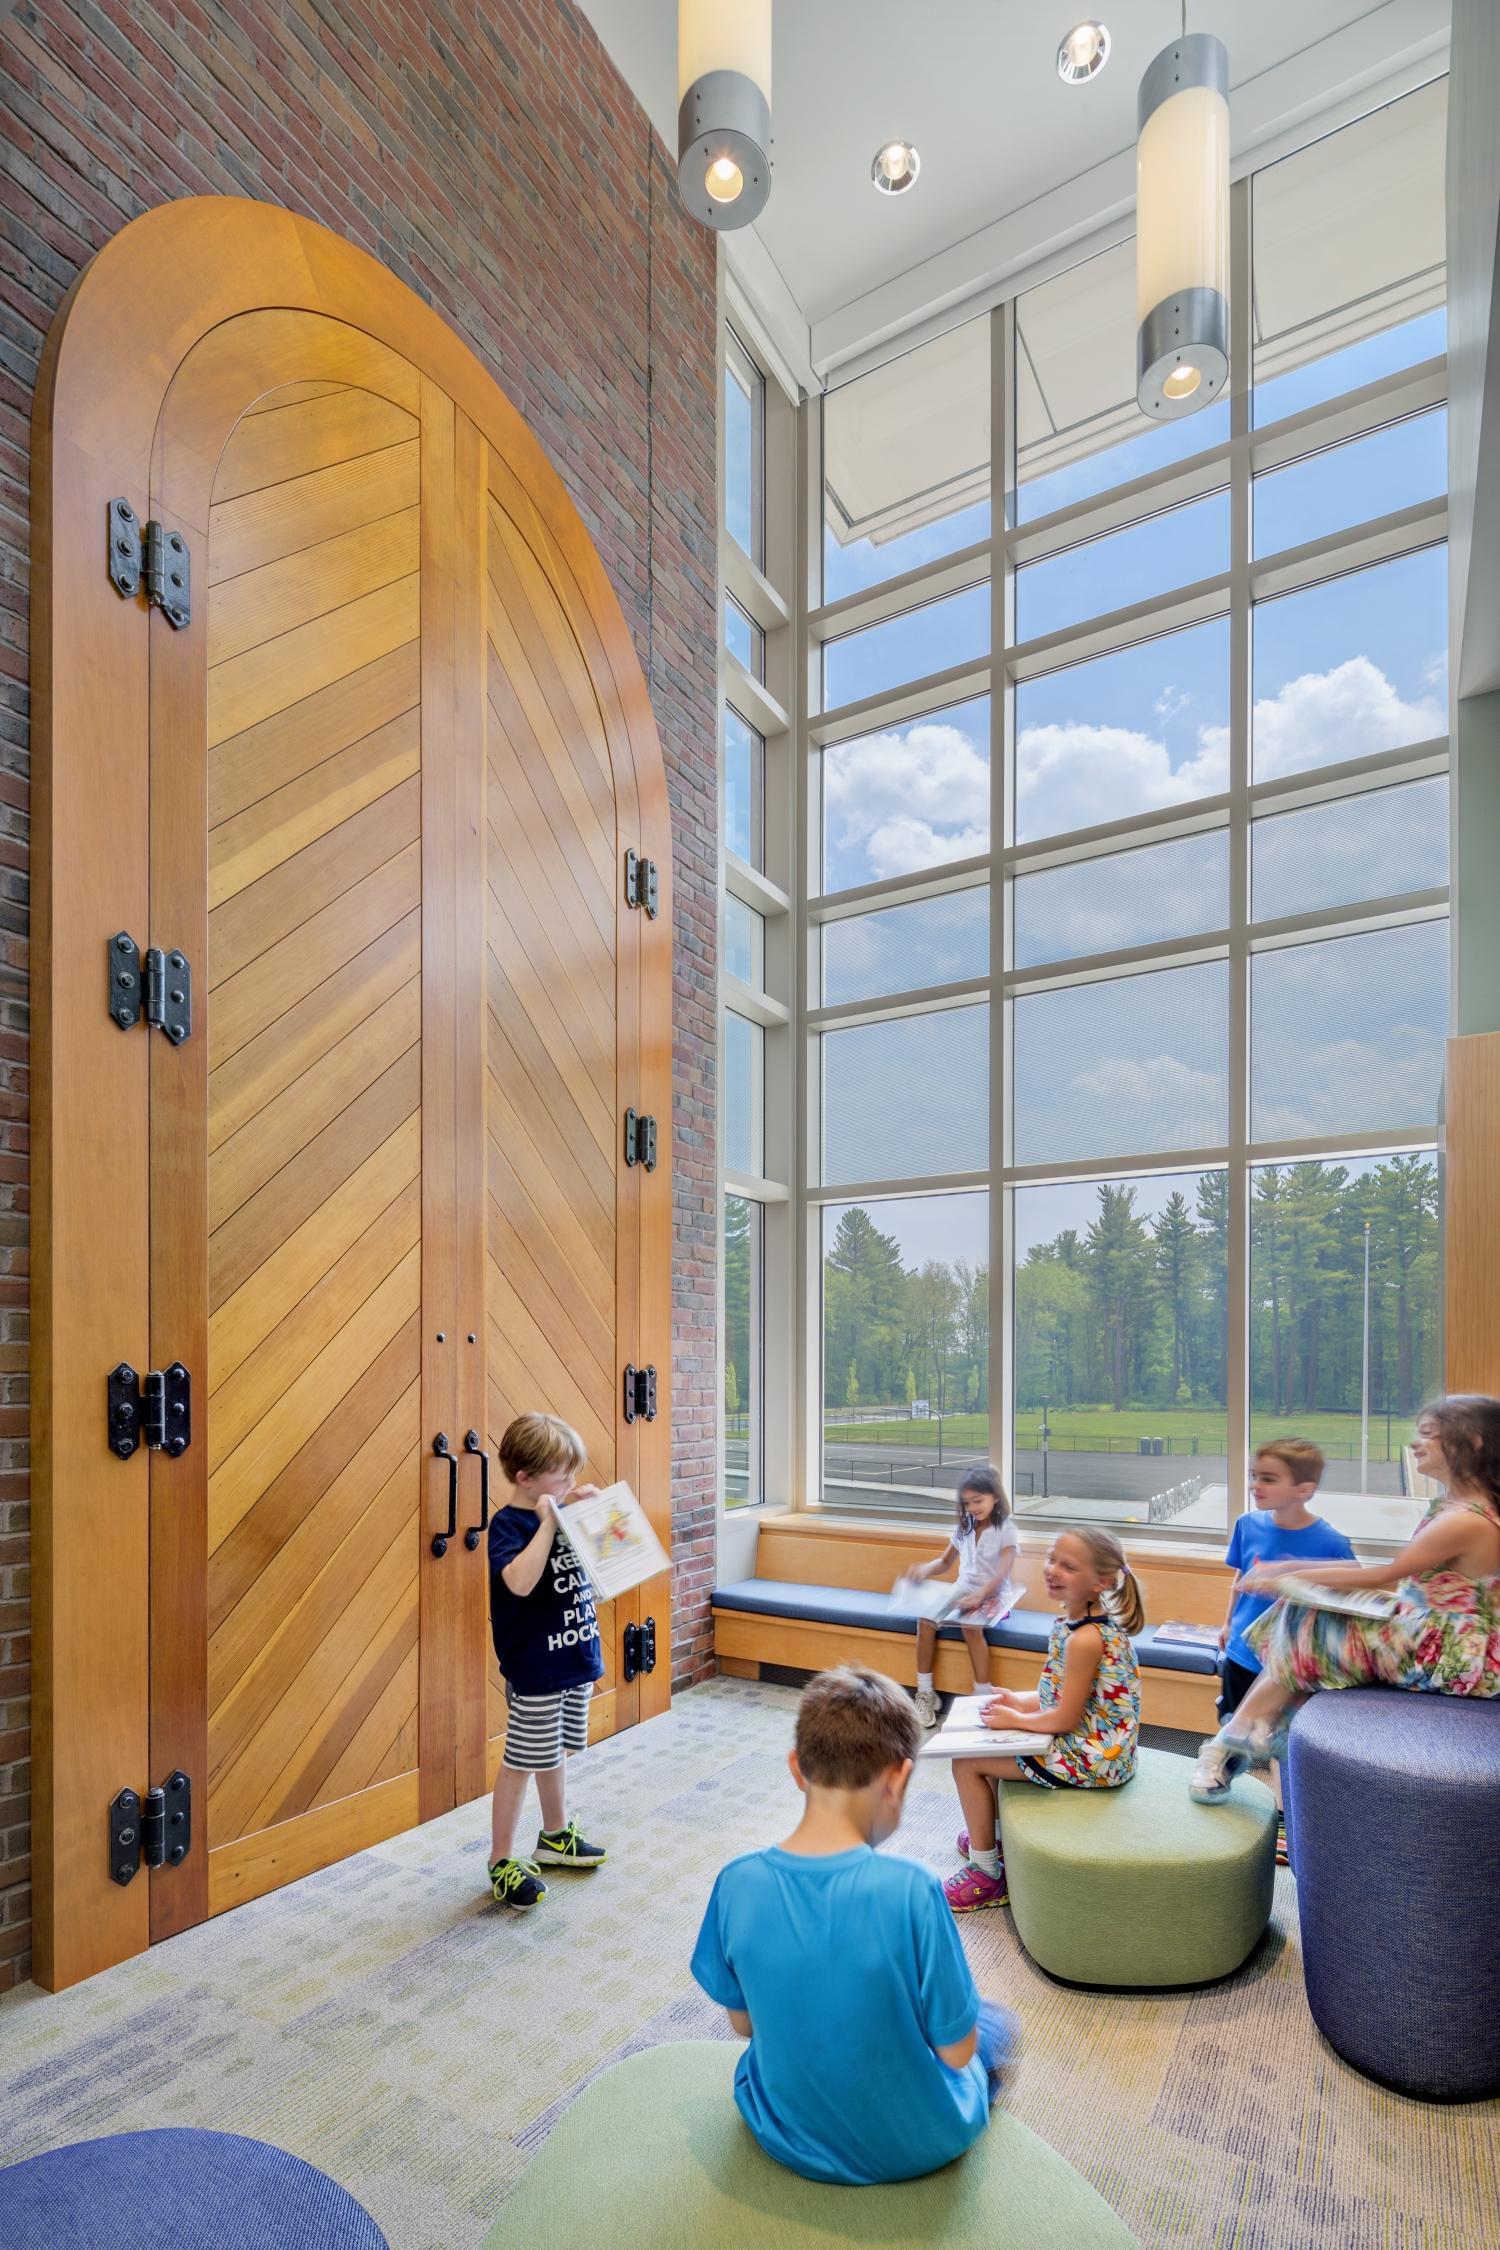 SMMA Elementary School Classroom Design for Bancroft Elementary